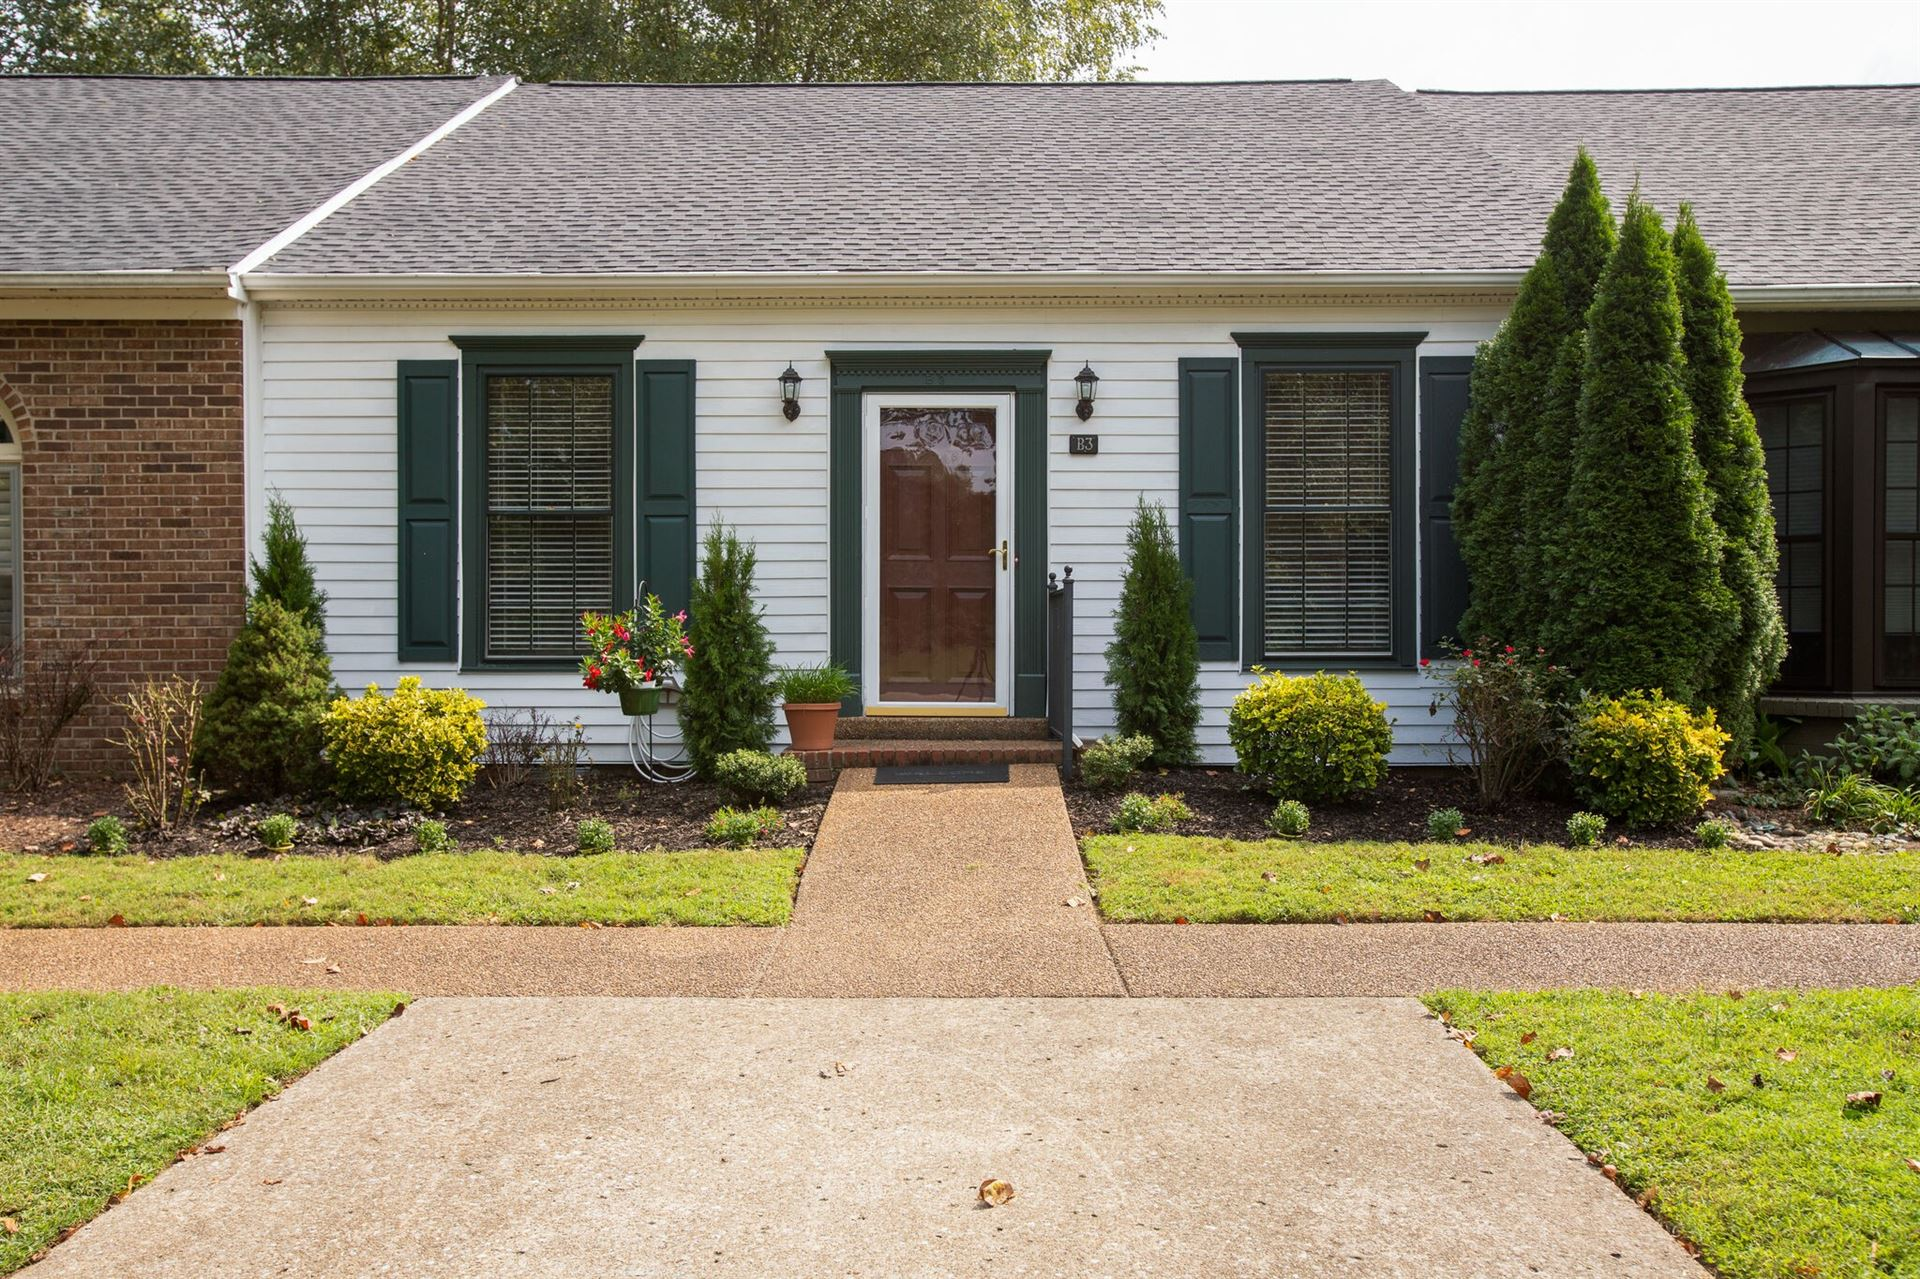 1115 Carnton Ln B3, Franklin, TN 37064 - MLS#: 2189889